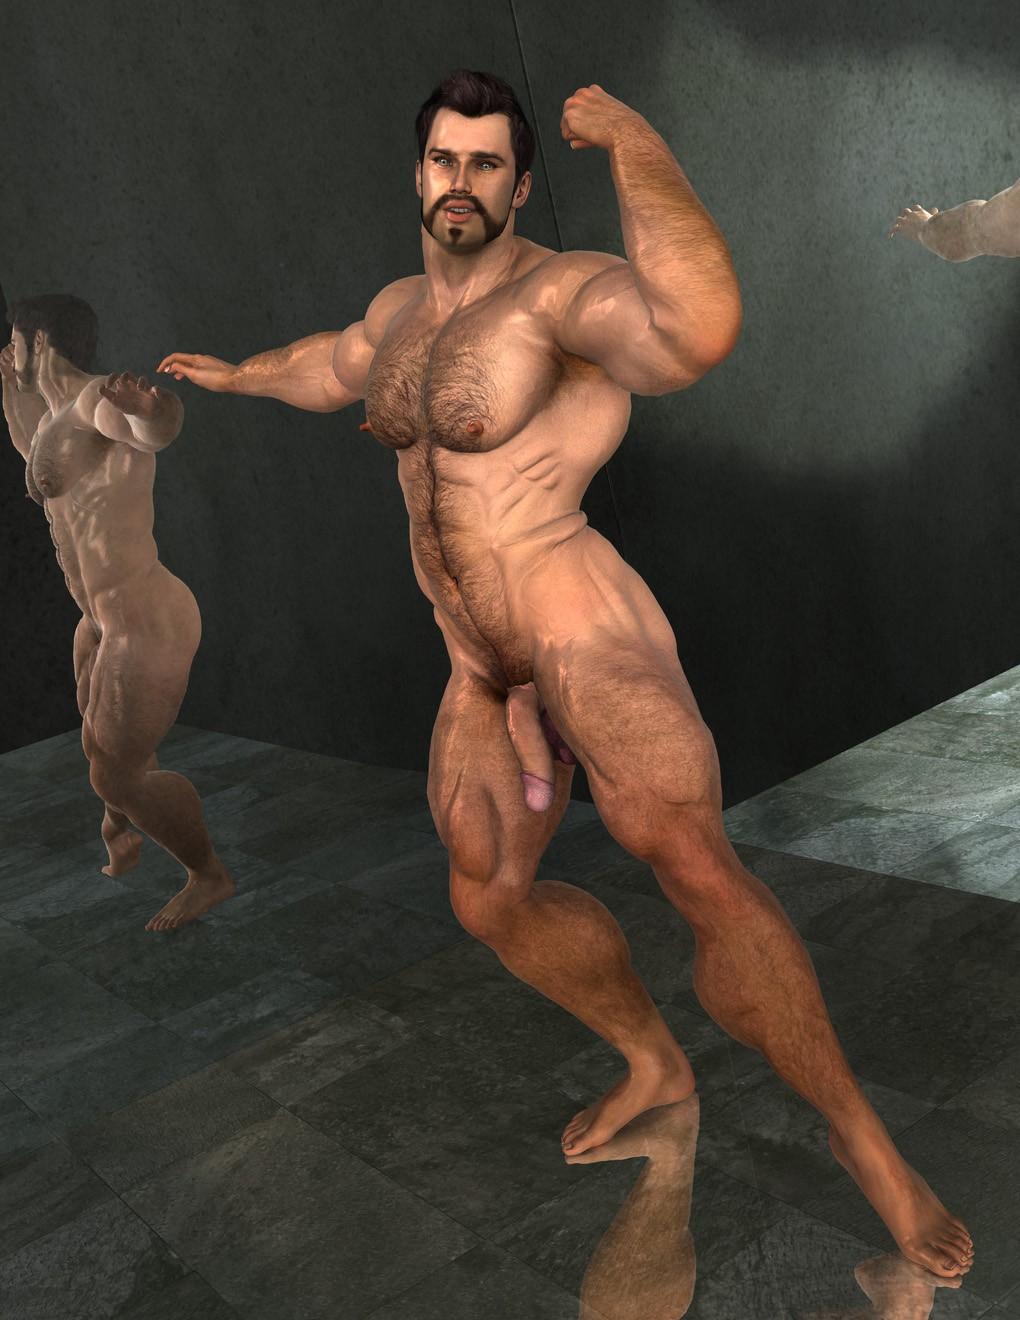 Free gay 3d adult movie